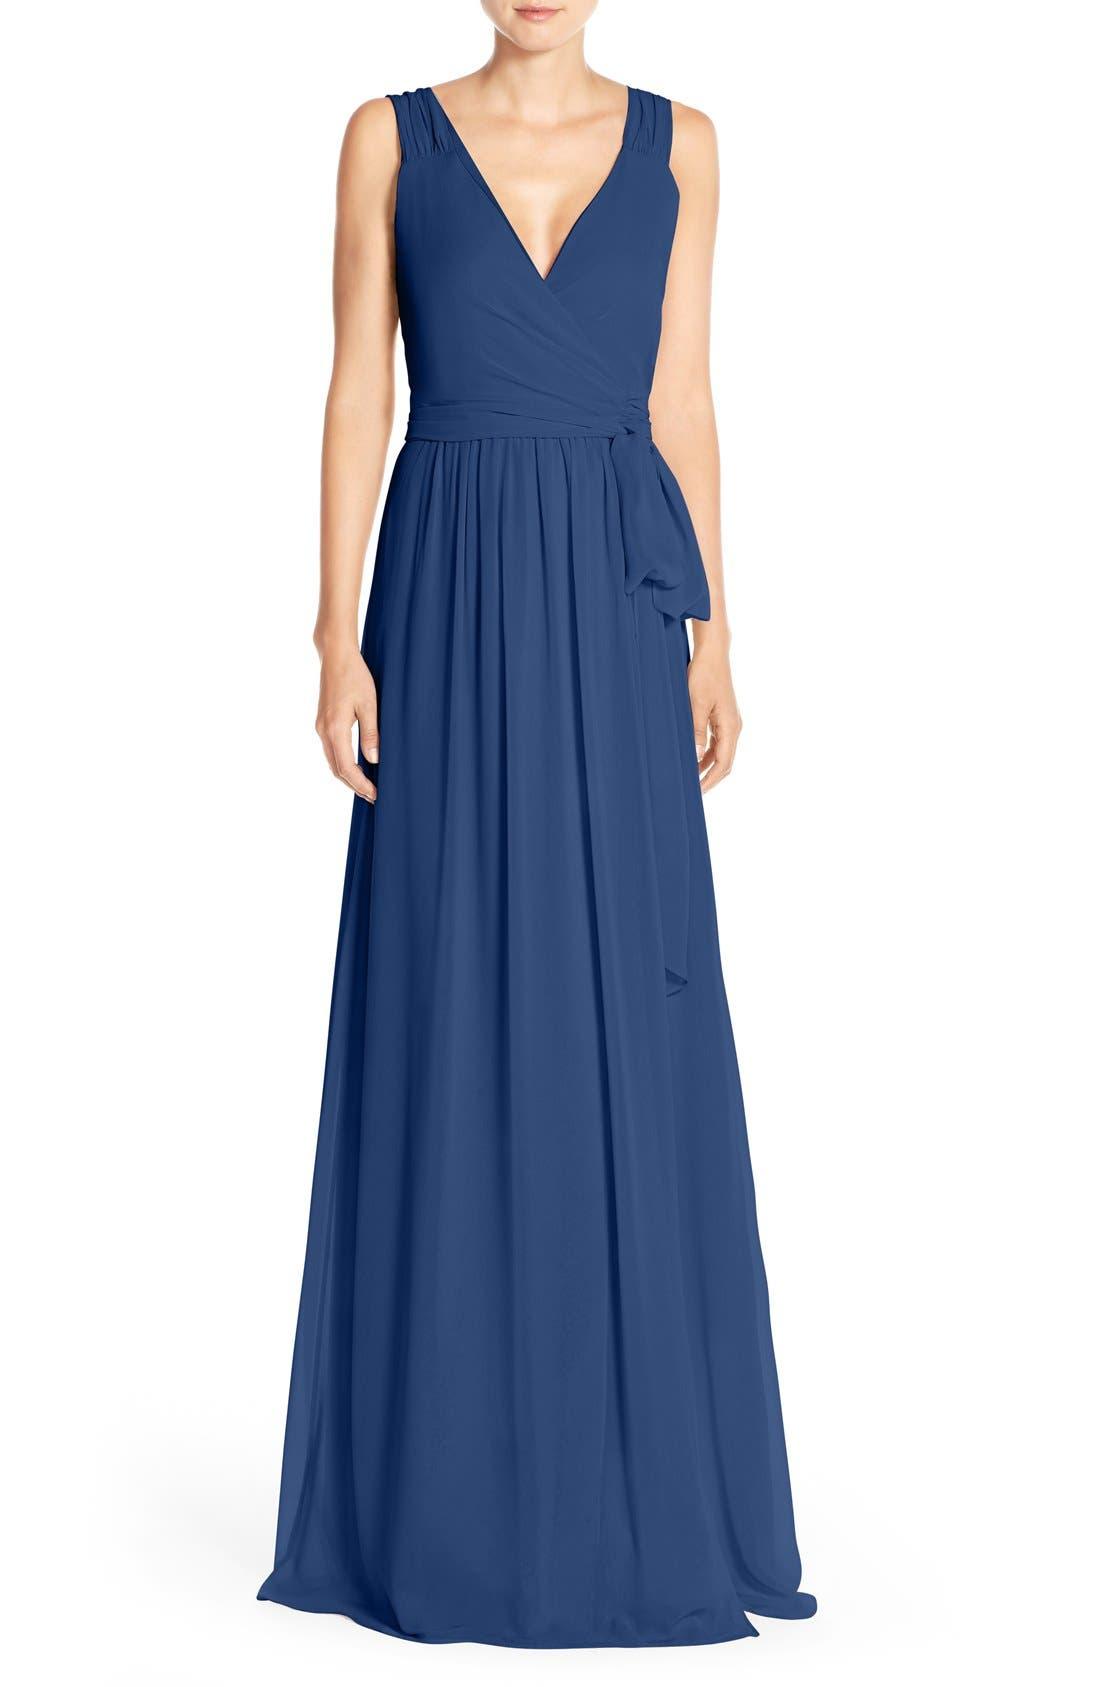 Main Image - CeremonybyJoanna August'Newbury' Gathered Sleeve Chiffon Wrap Gown